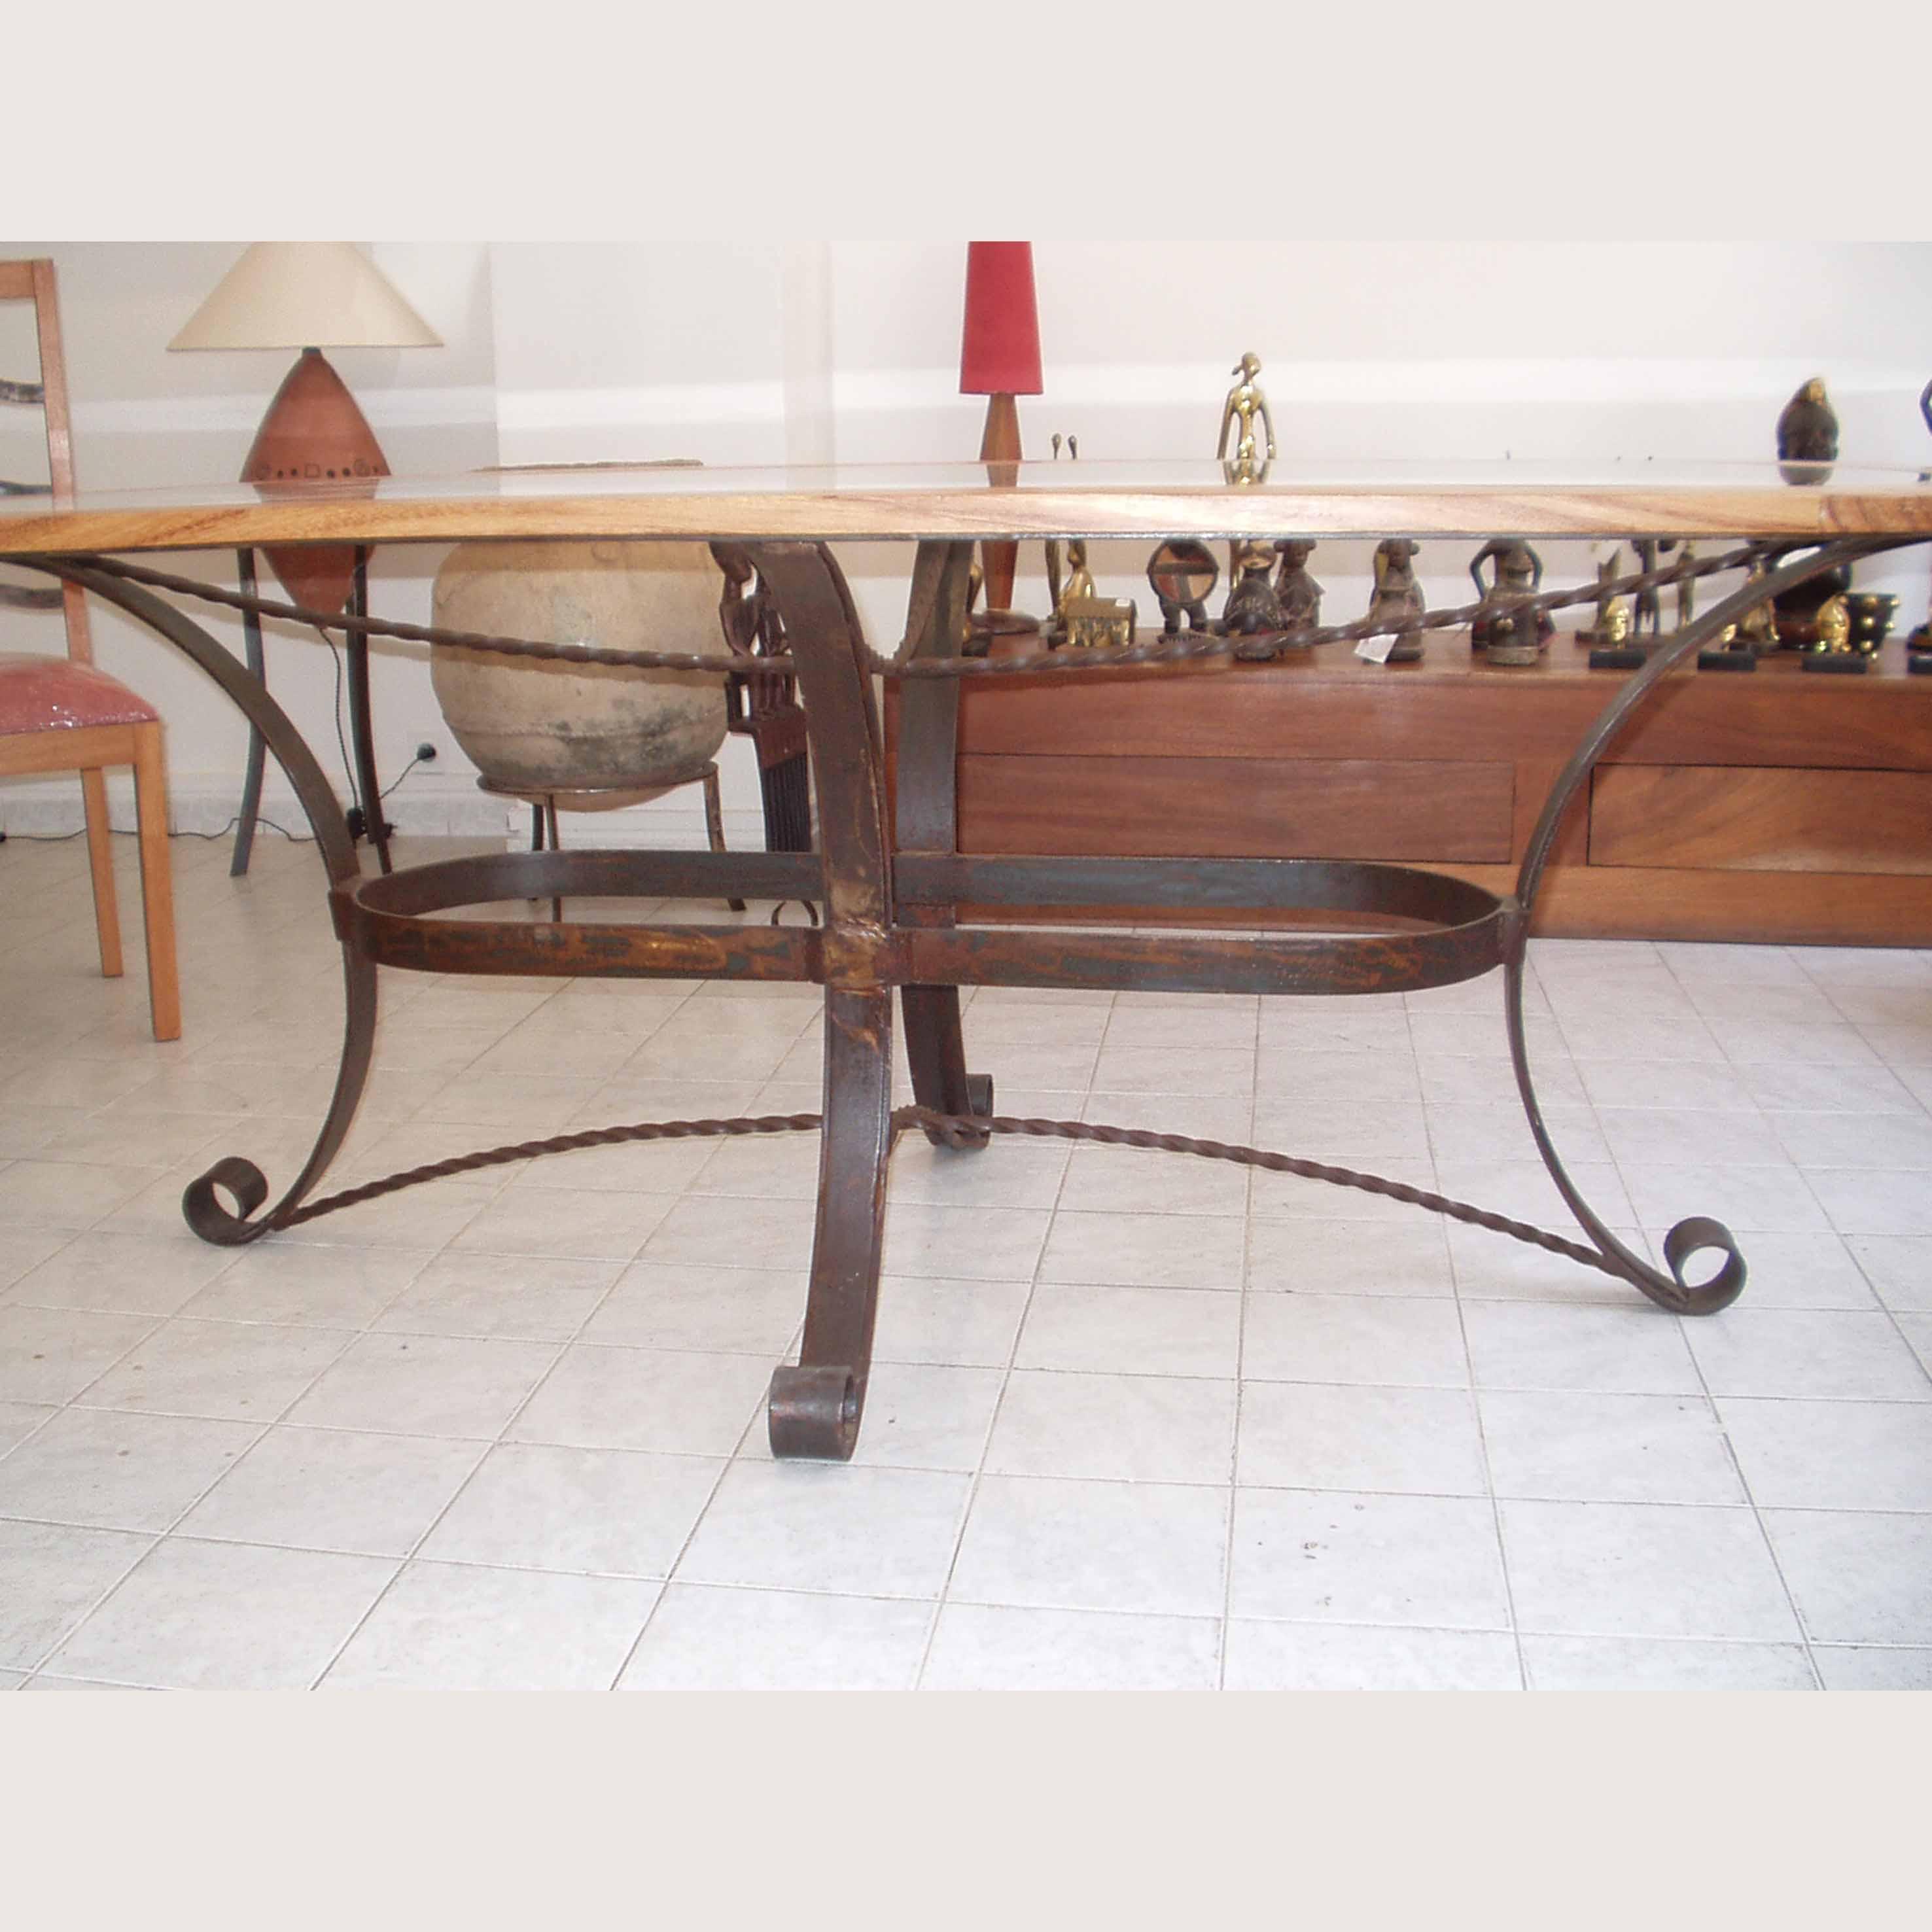 Table Salle À Manger Et Chaises – Galerie Arte avec Table Salle A Manger En Fer Forgé